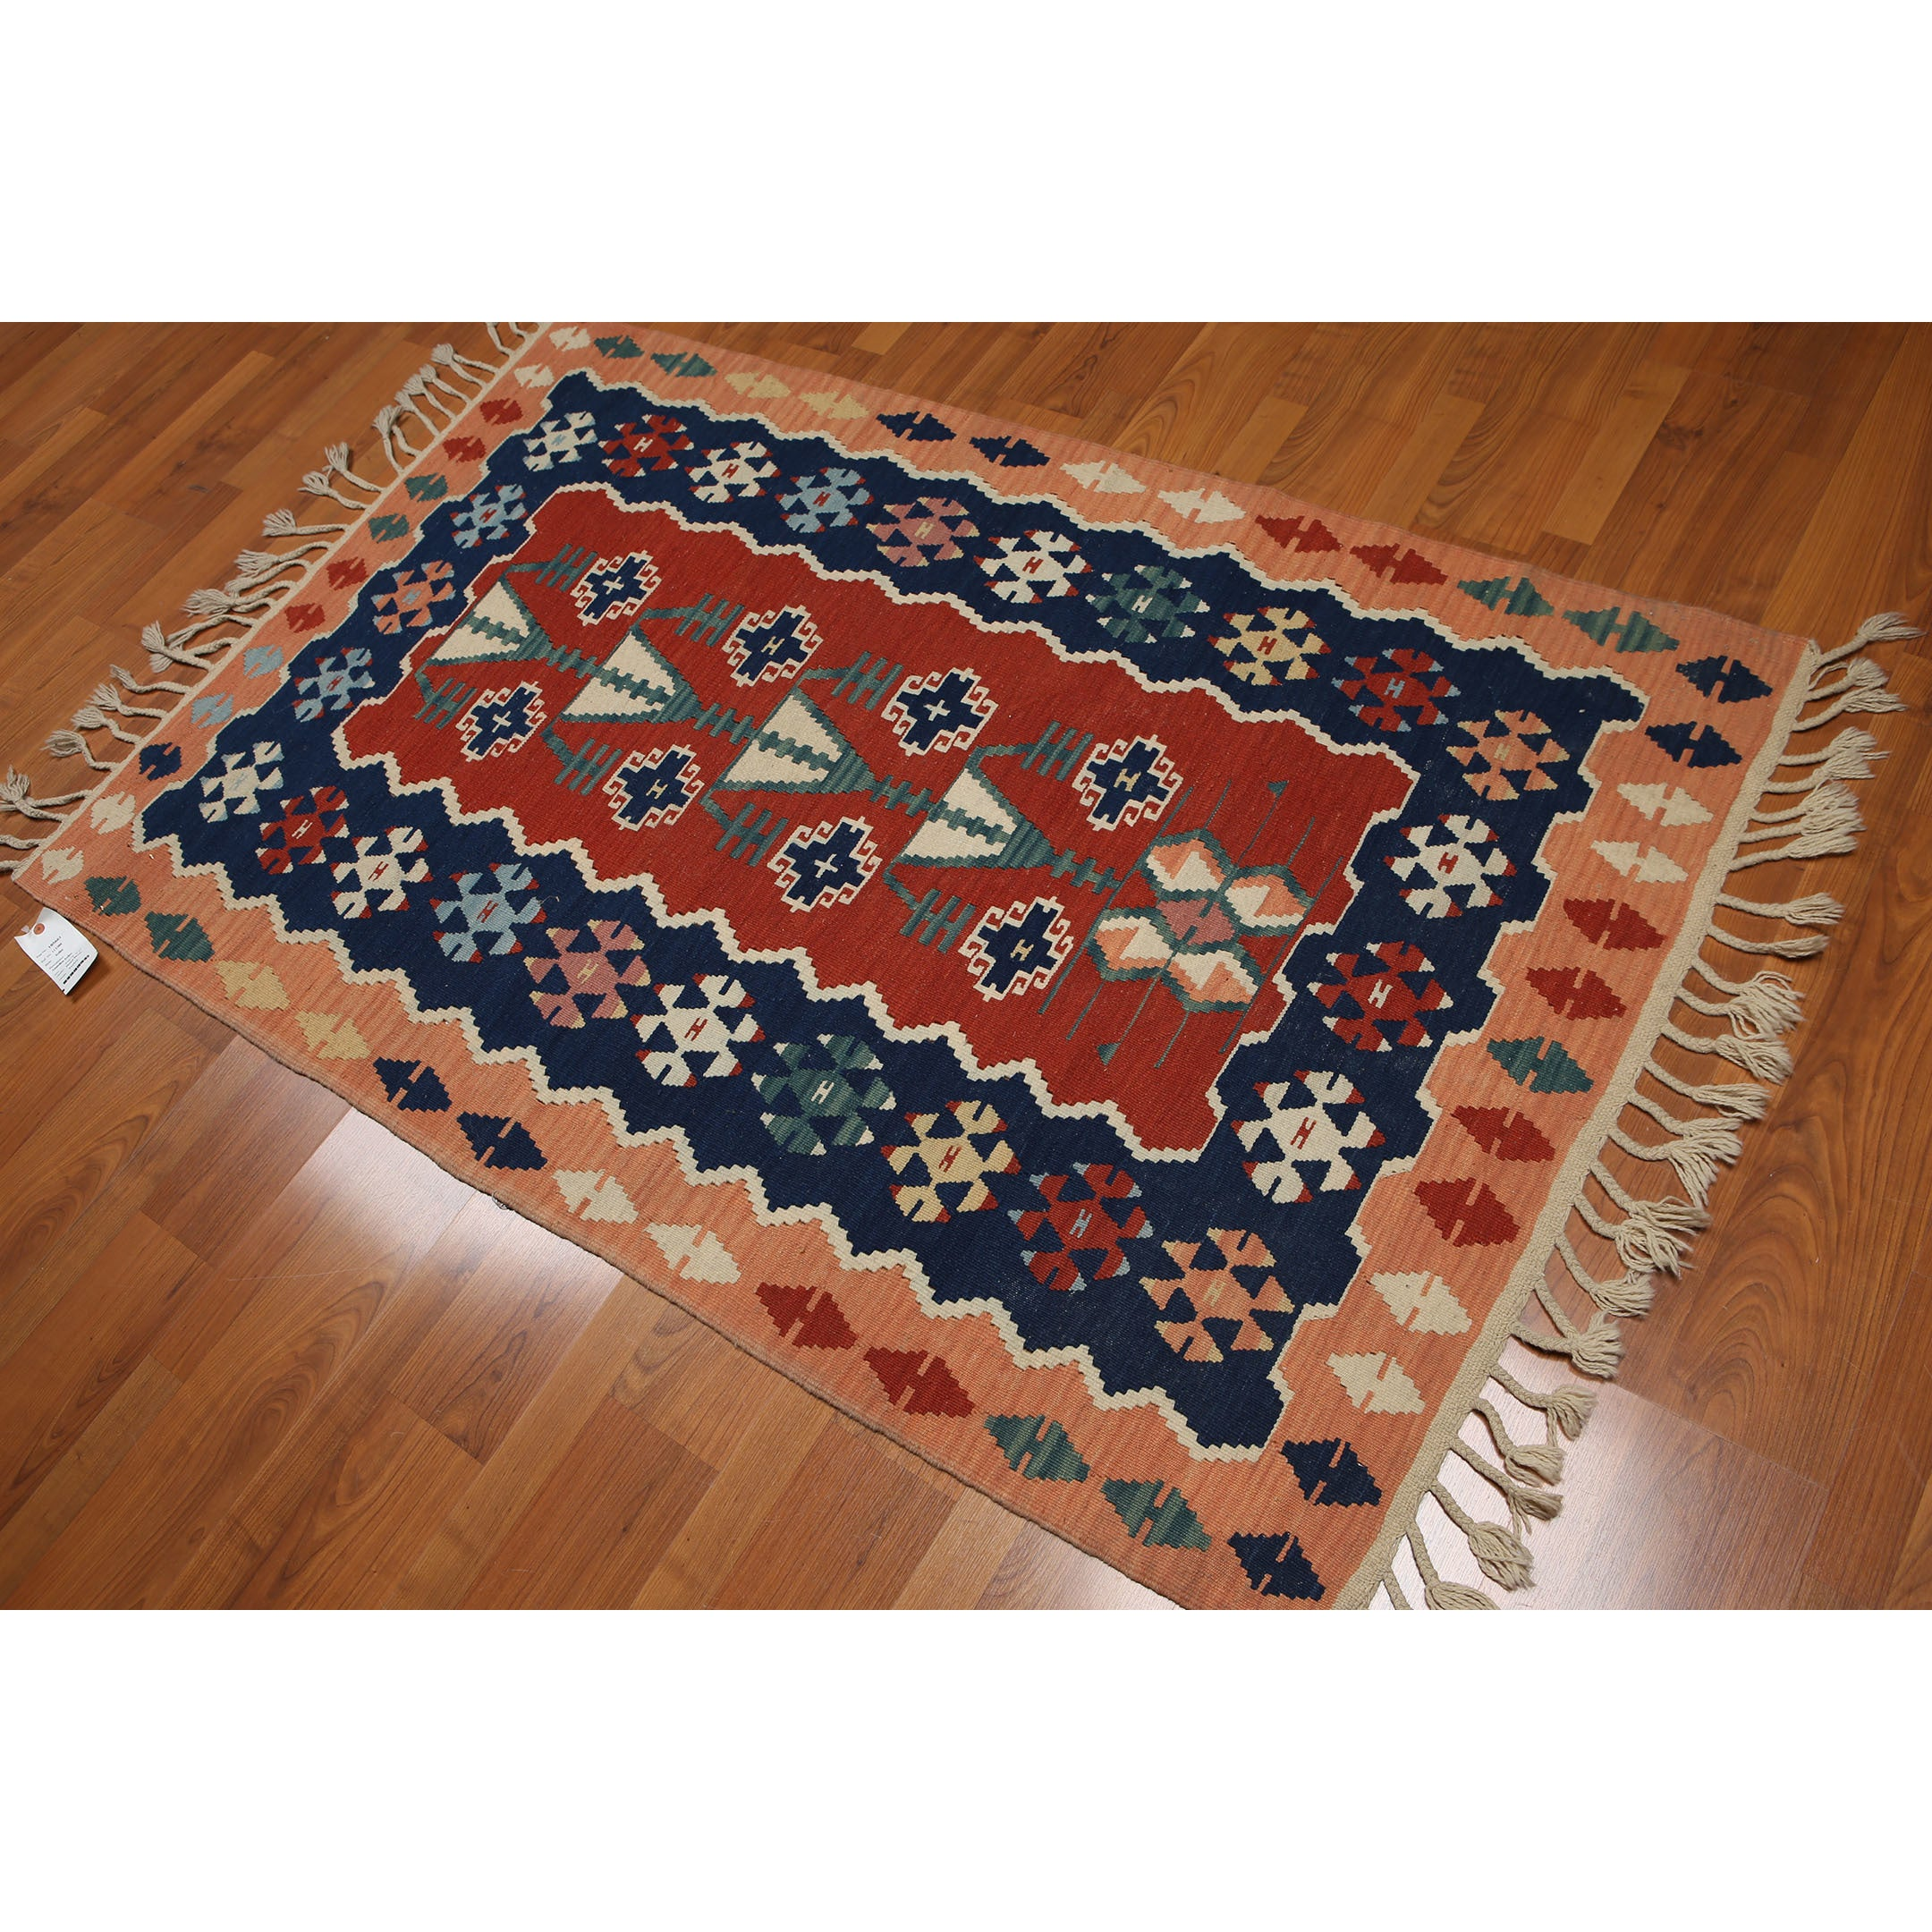 Turkish Tribal Dhurrie Kilim Multicolored Pure Wool Flat Woven Reversible Area Rug 4 X 6